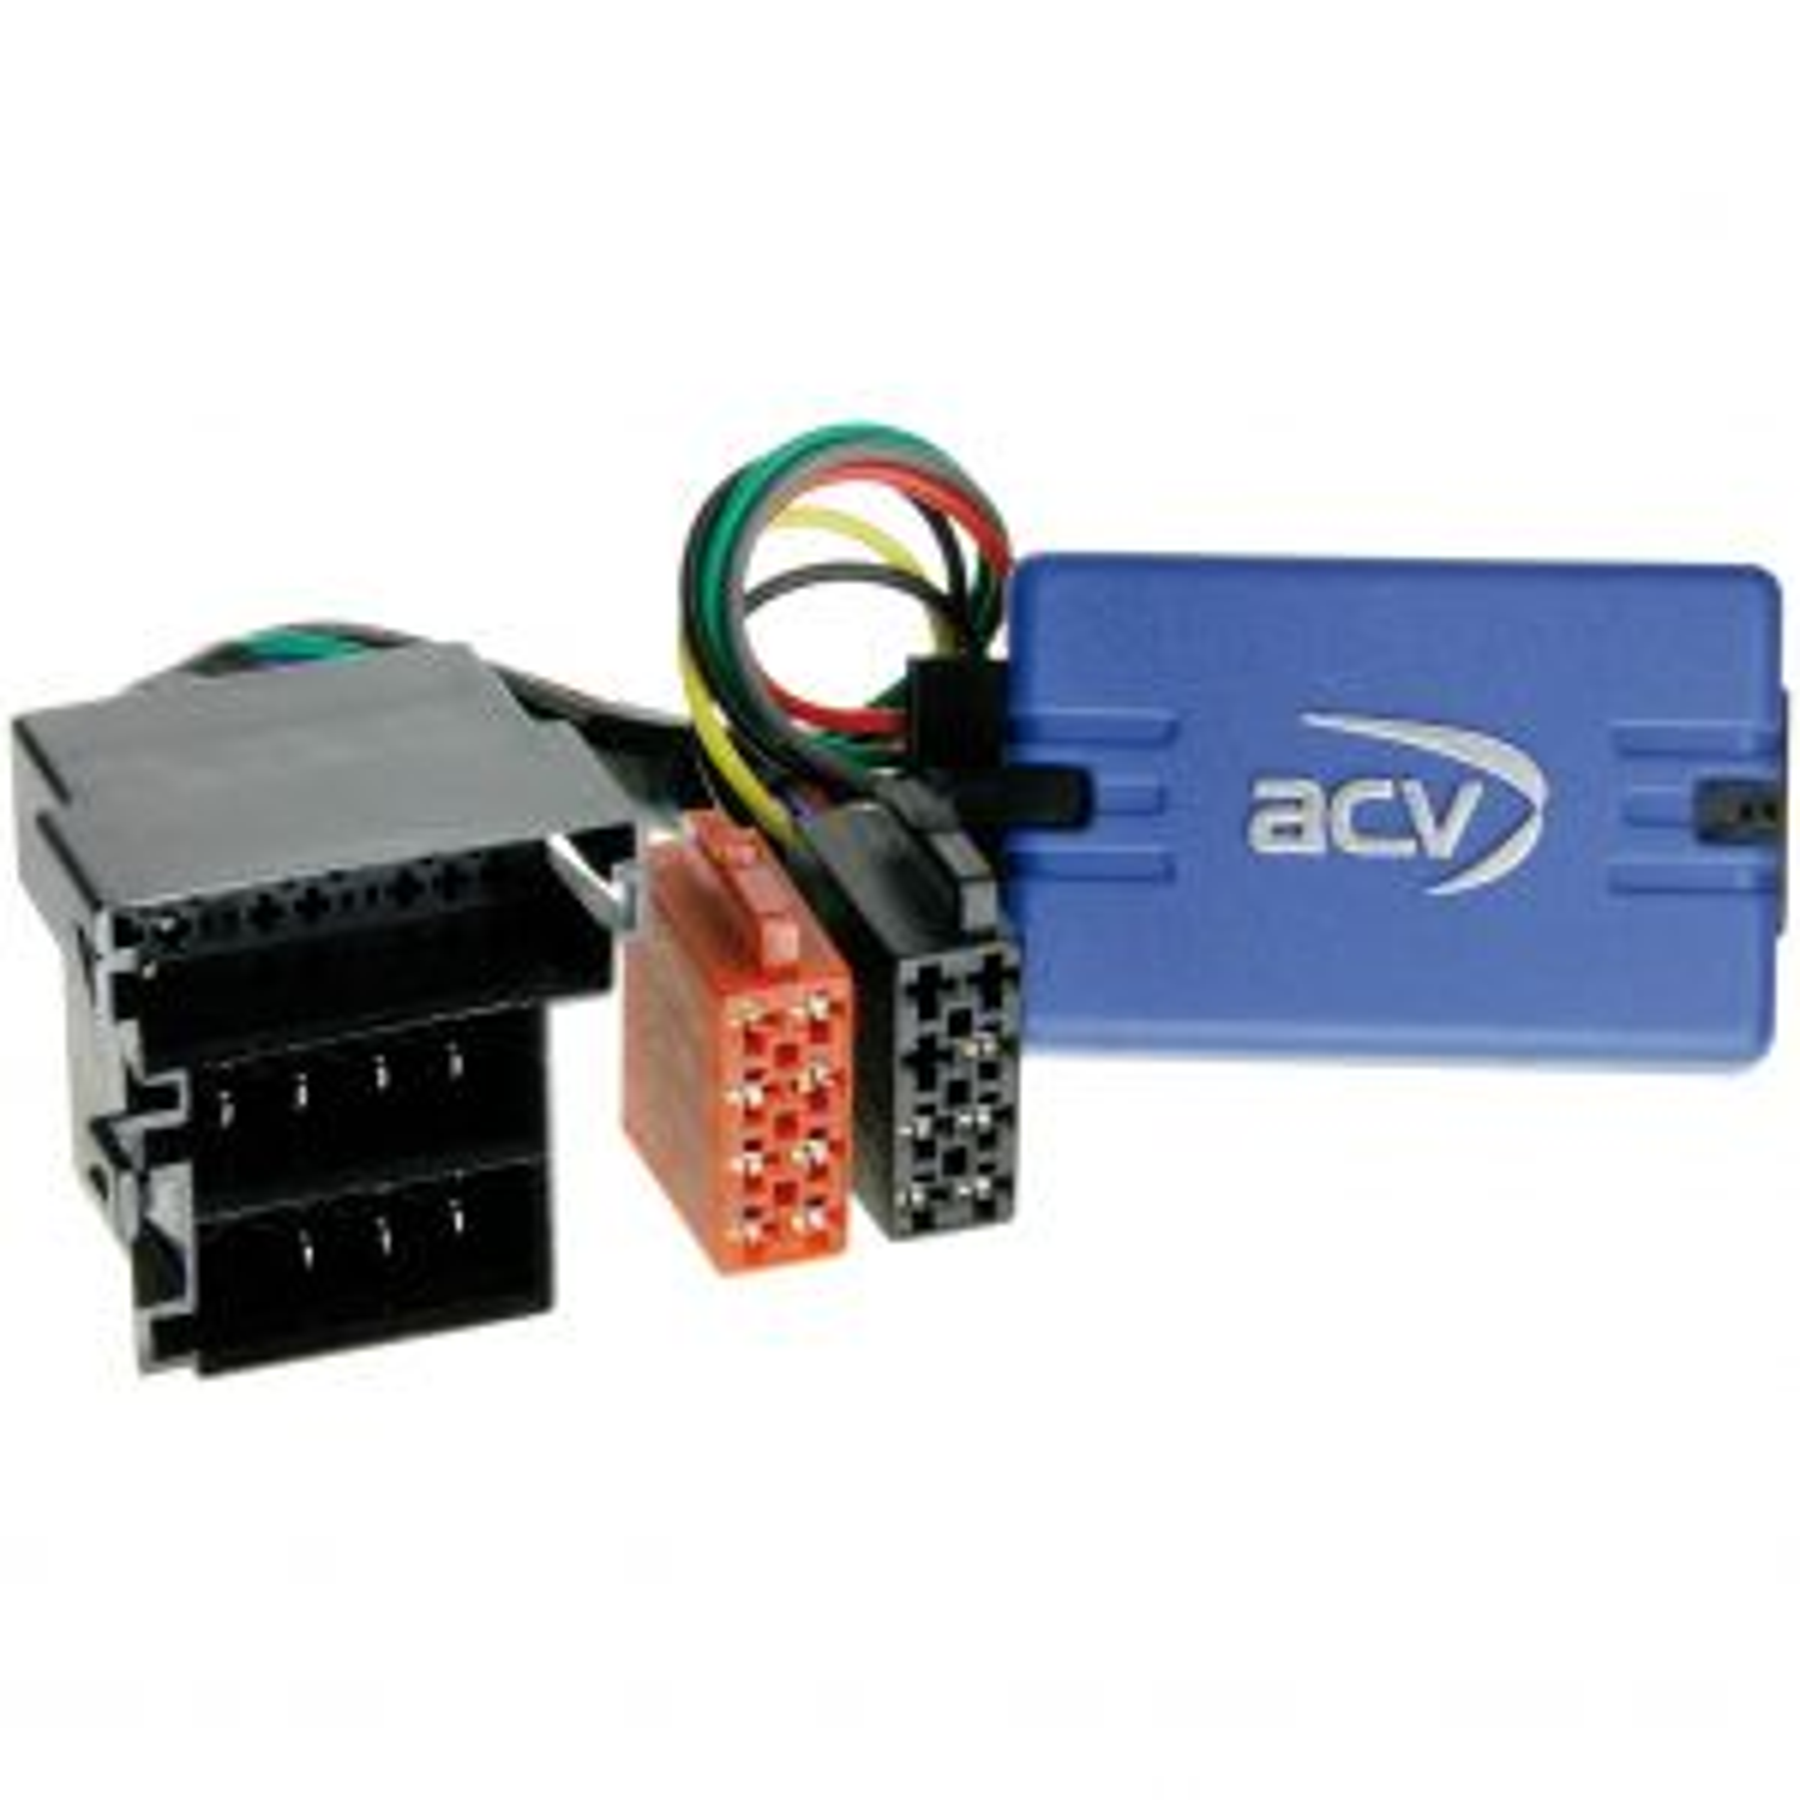 ACV 42SPG004